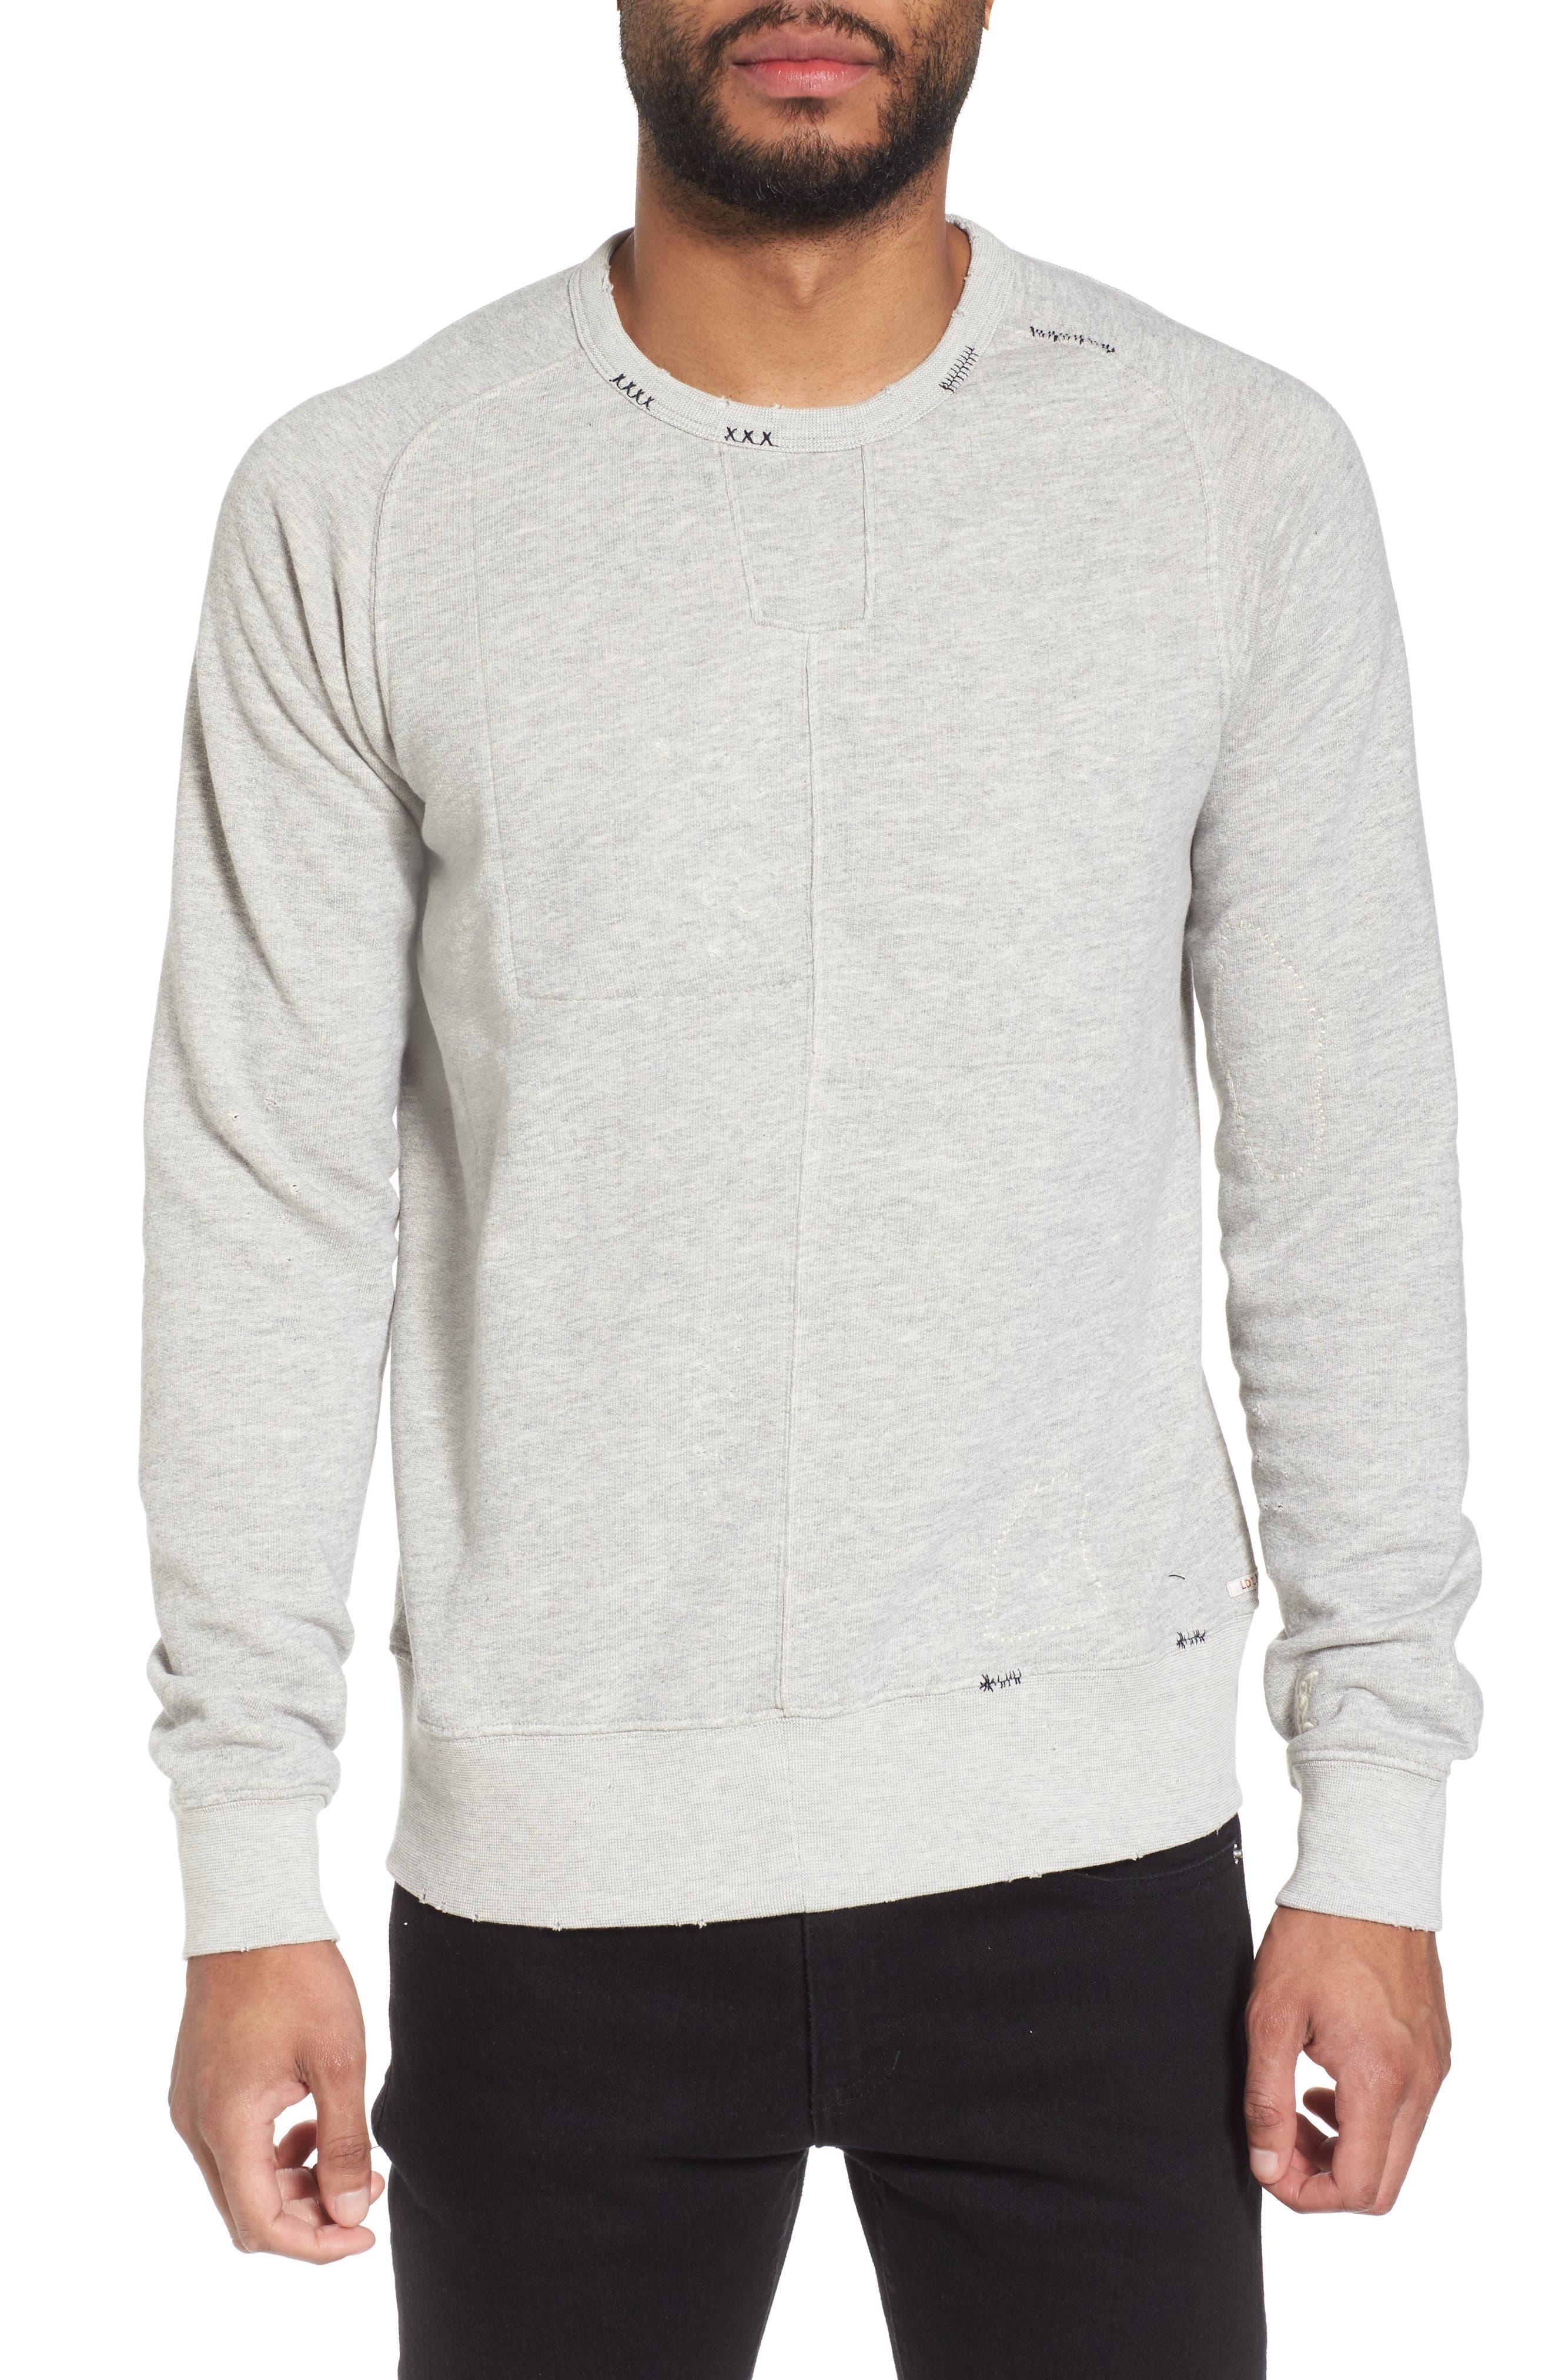 Main Image - Scotch & Soda Lot 22 Sweatshirt